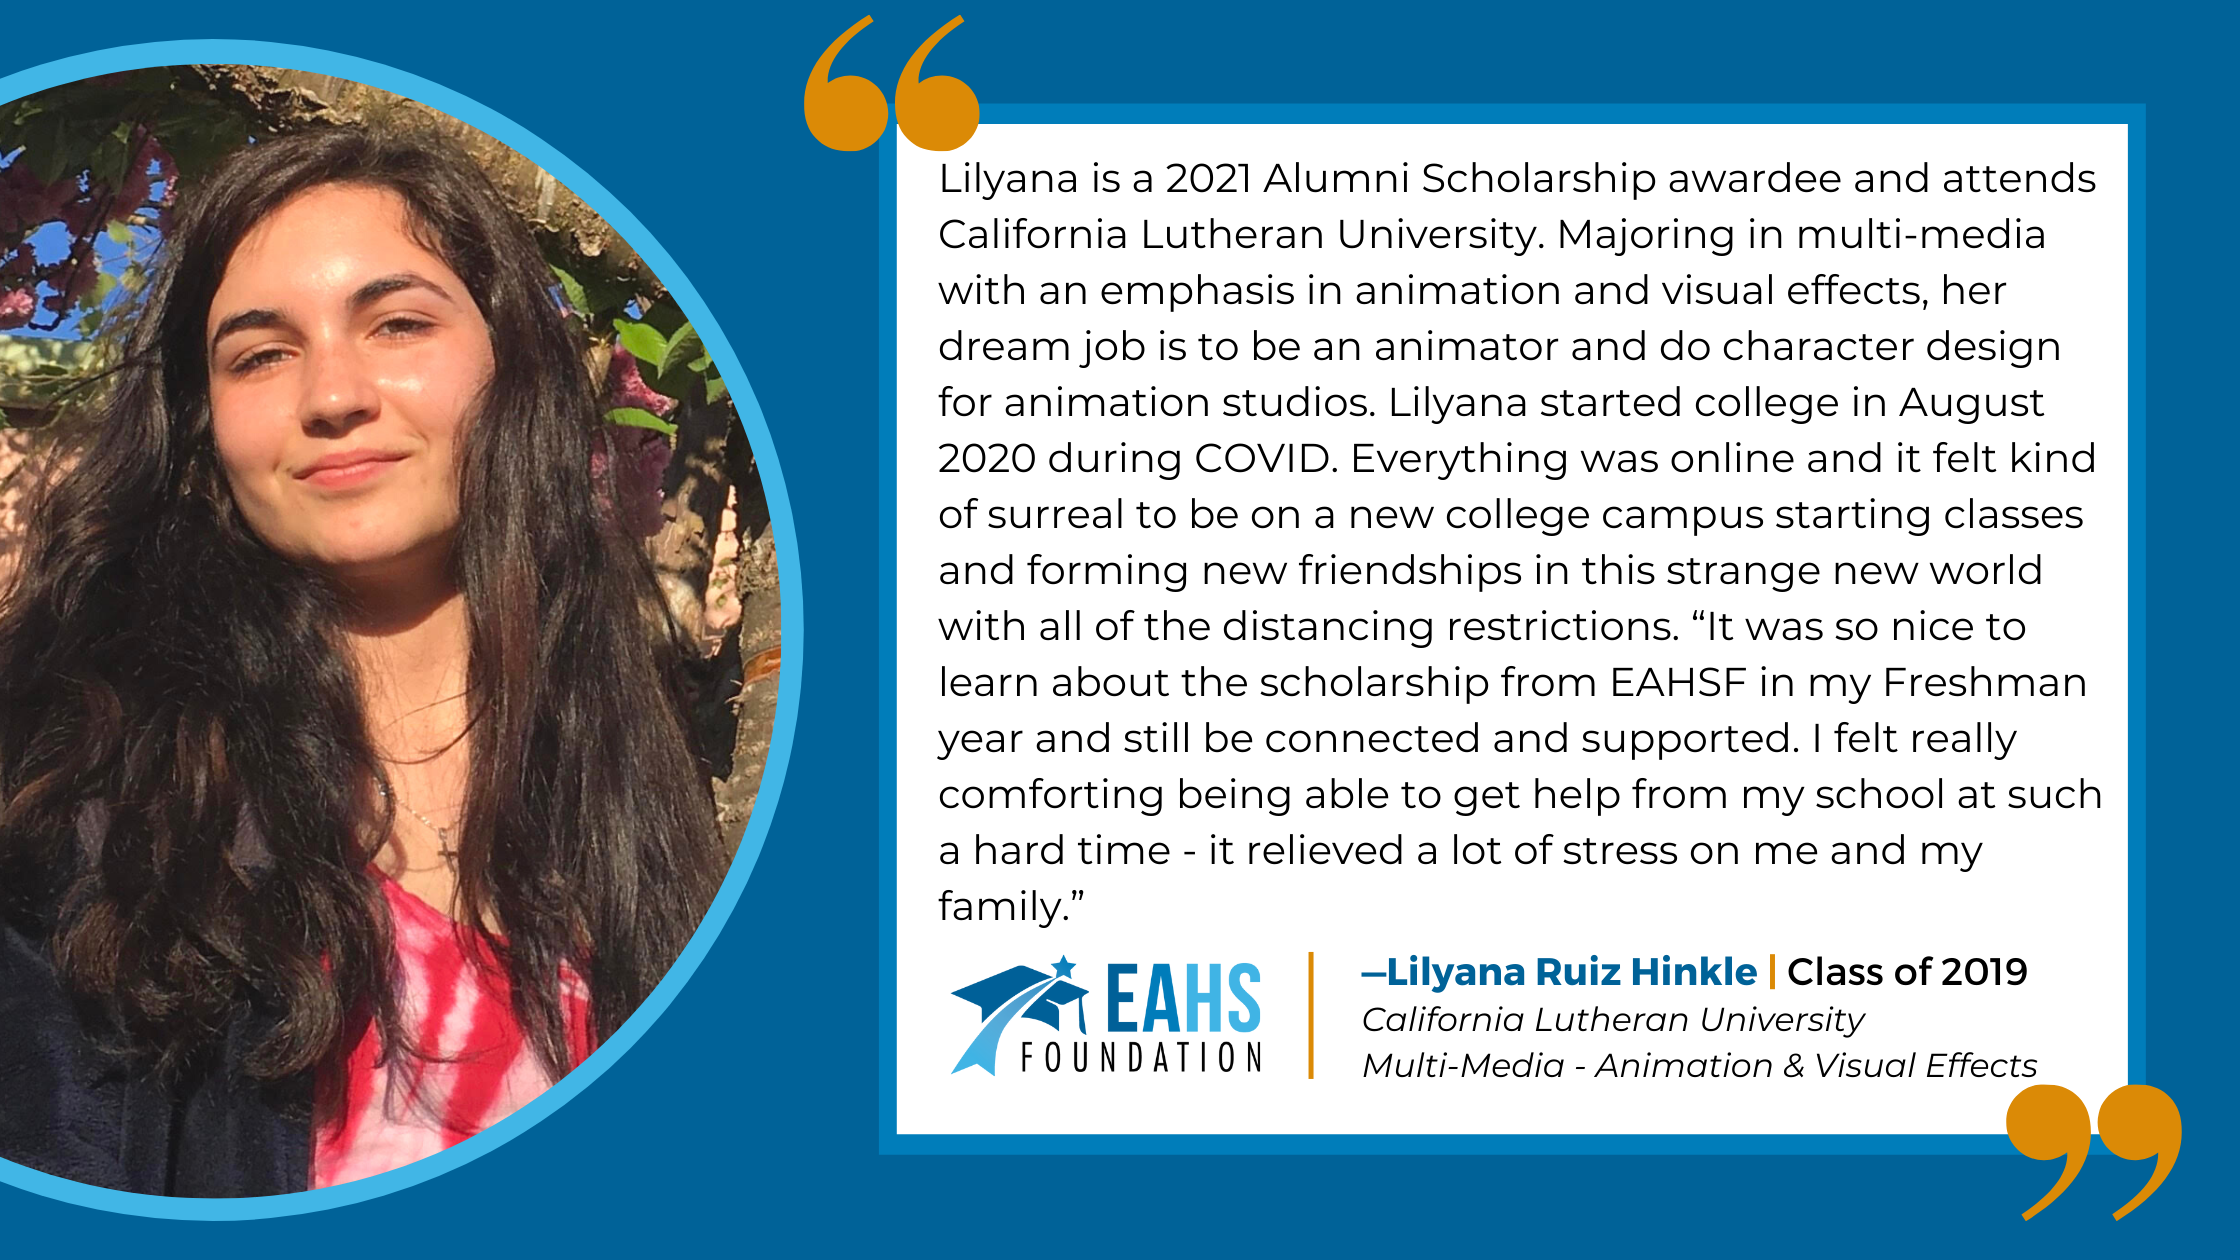 Alumni Spotlight - Lilyana Ruiz Hinkle, EAHS Foundation